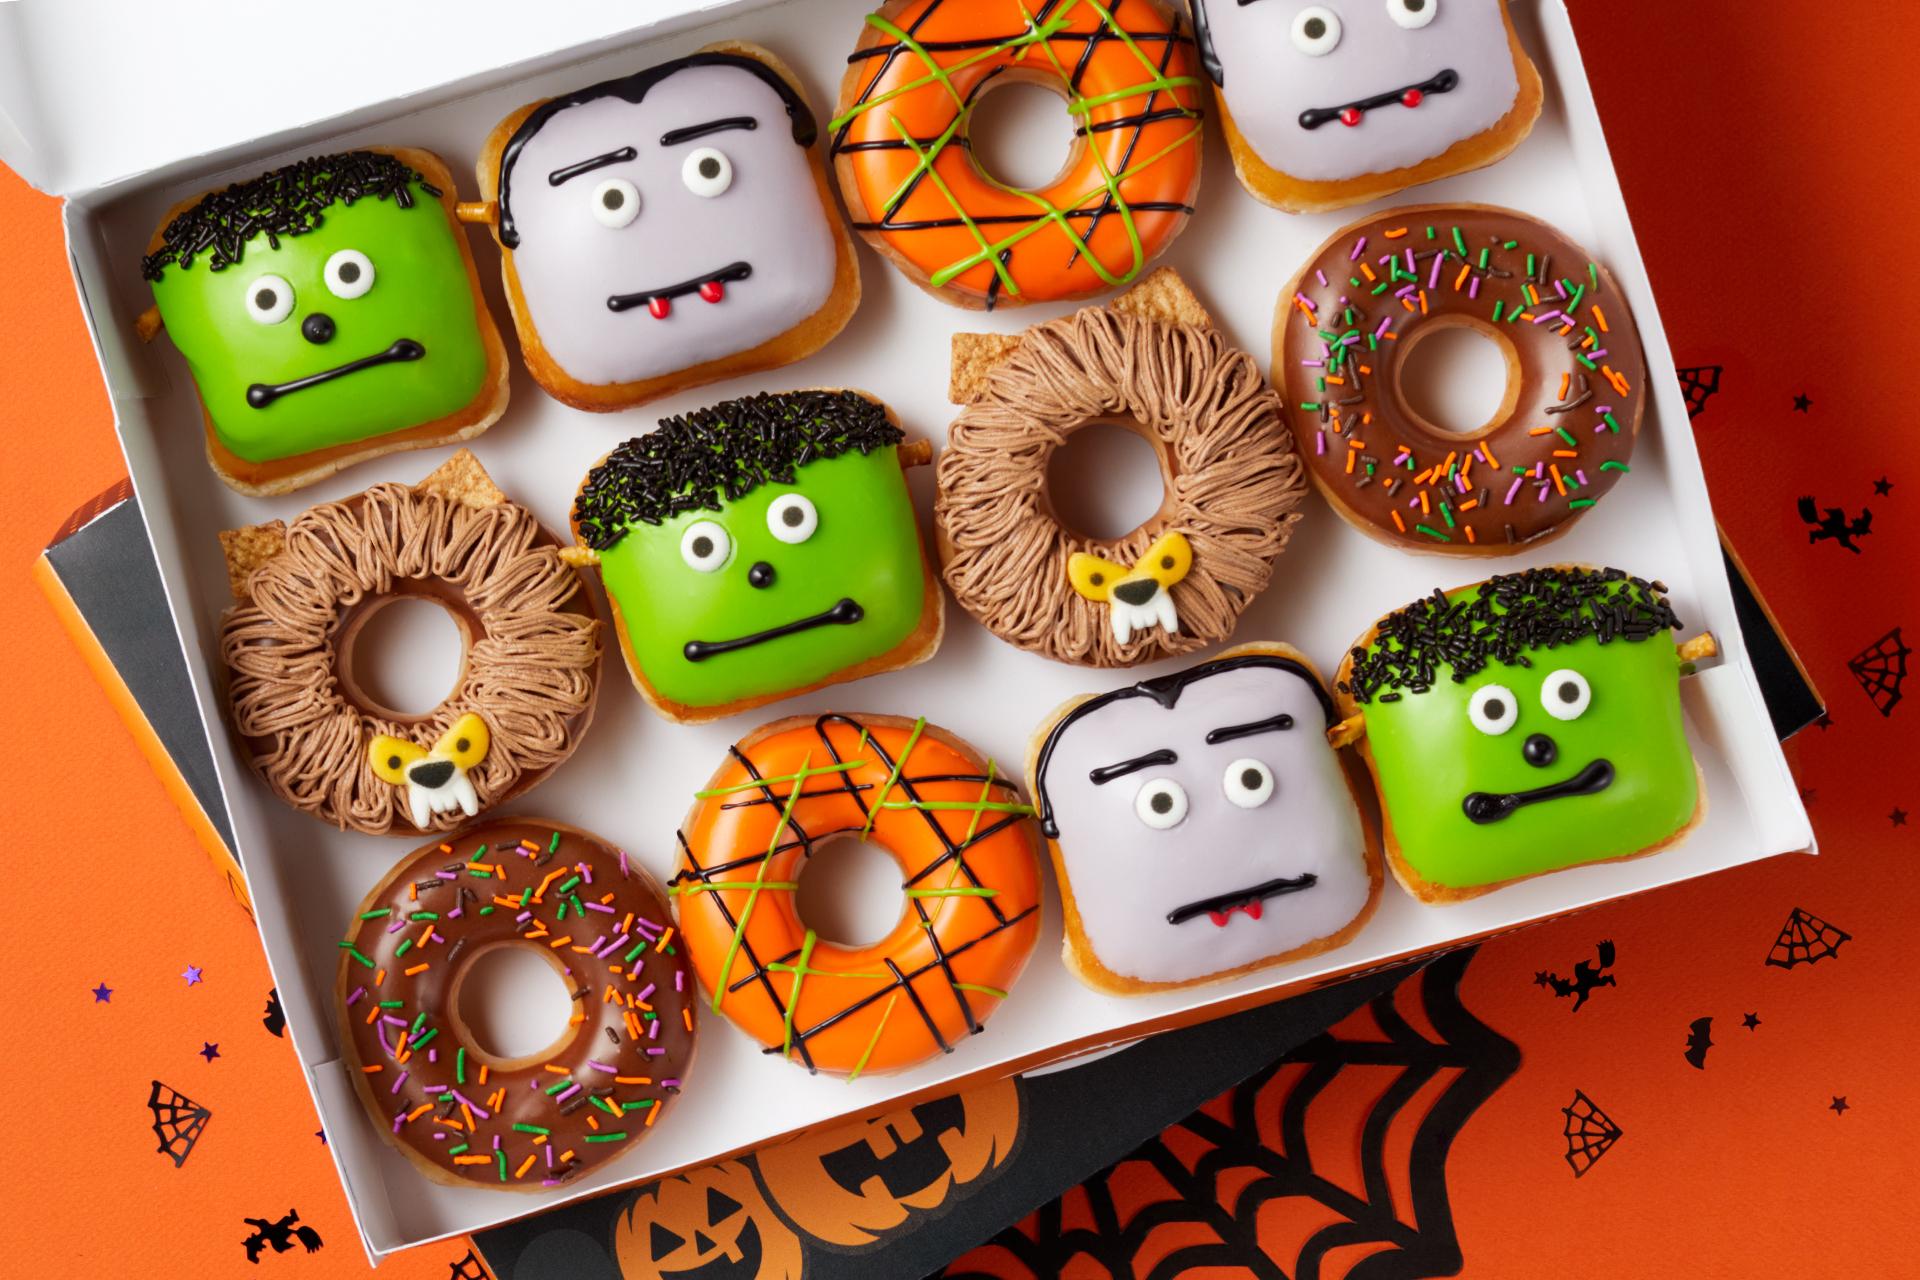 Krispy Kreme Halloween Doughnuts 2020 Flavors Krispy Kreme offering free doughnuts to anyone who visits in